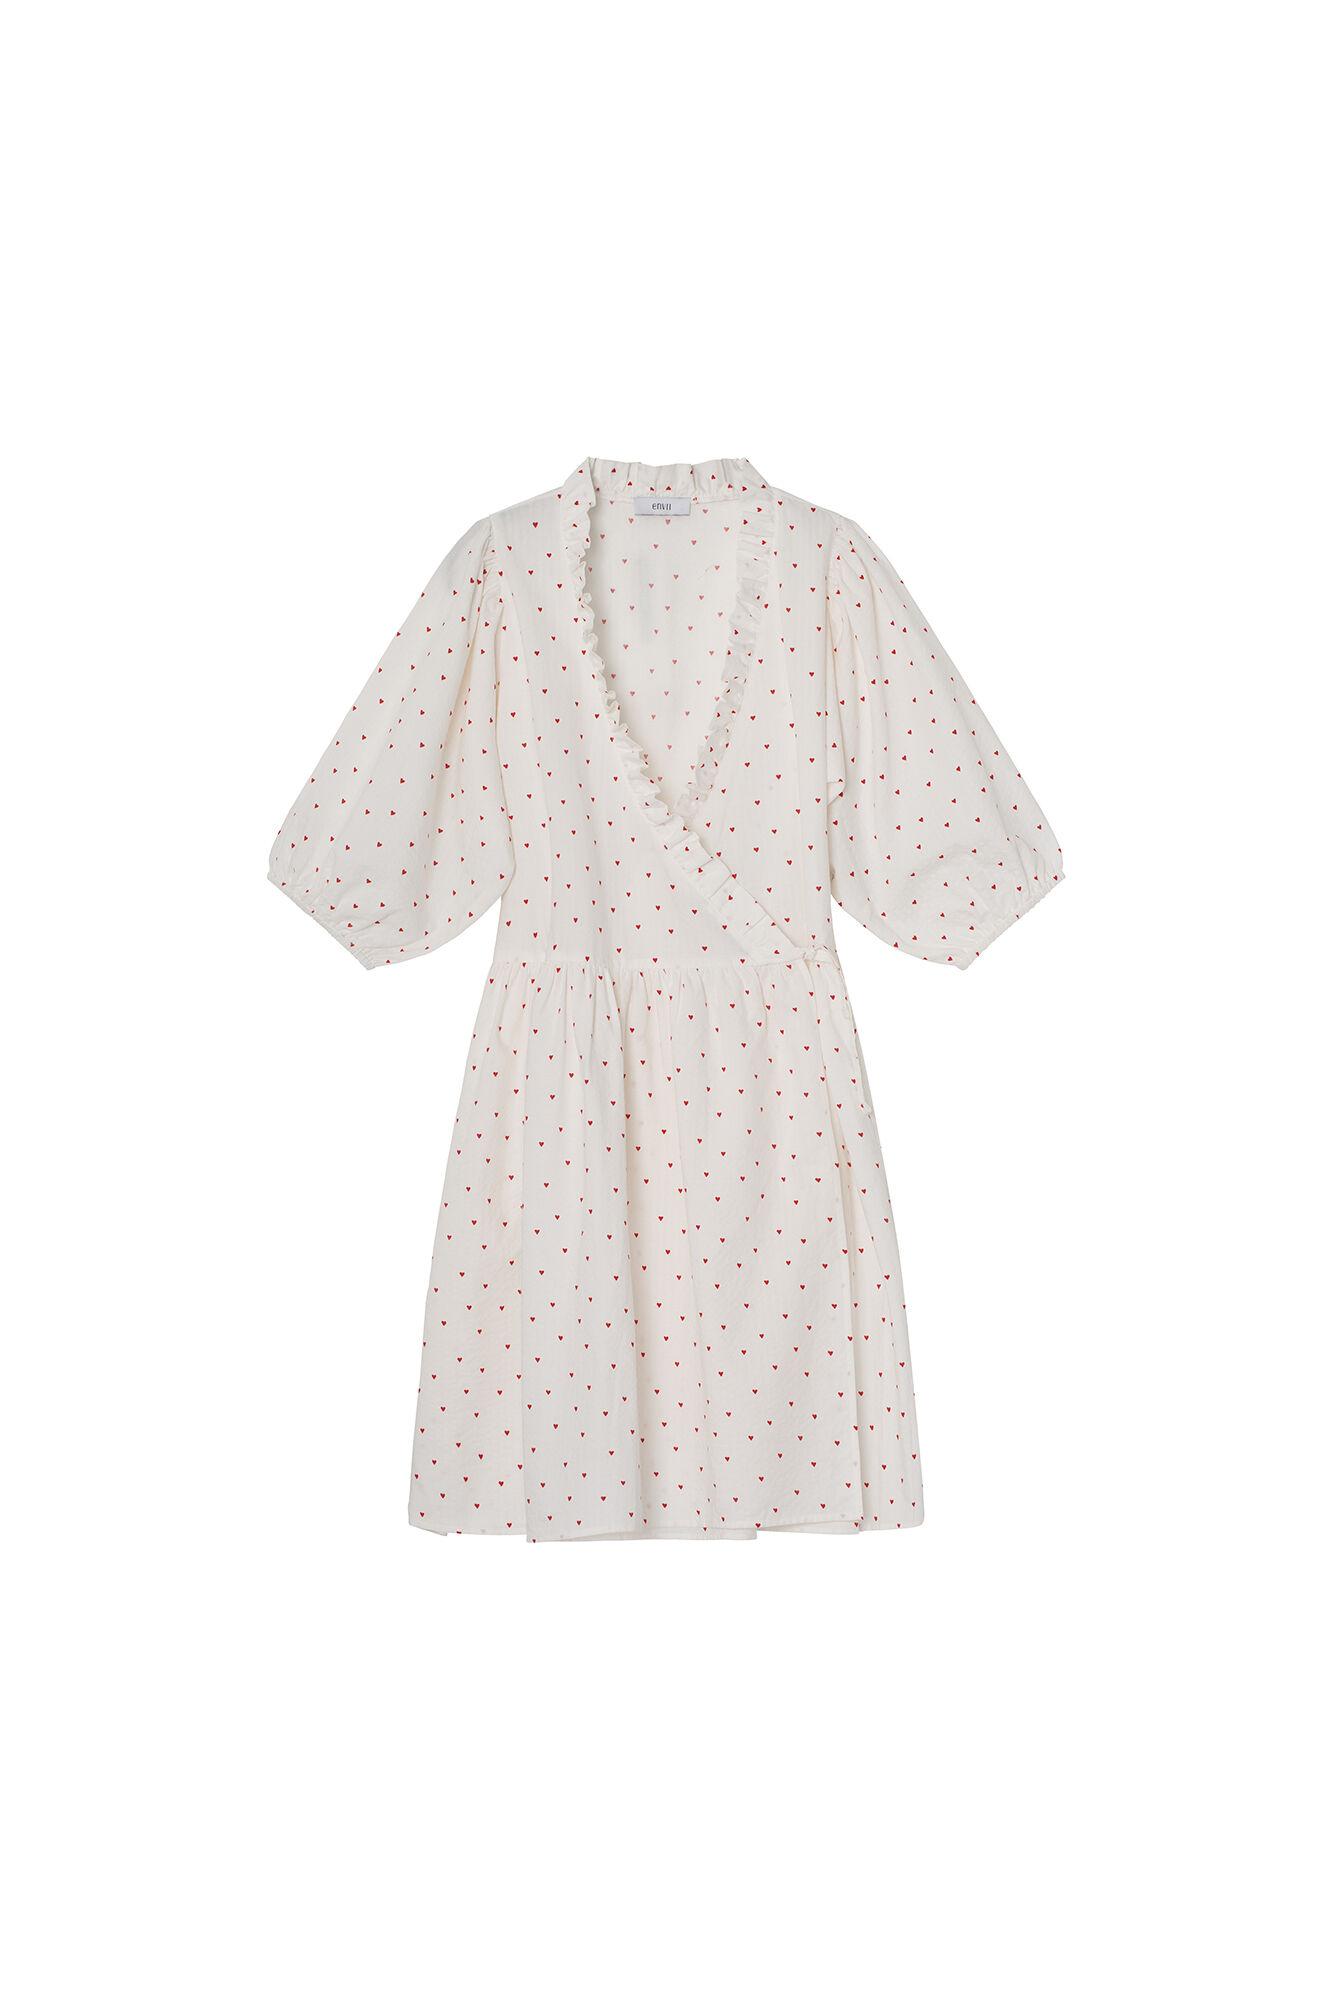 ENNIGHTTIME WRAP DRESS 6743